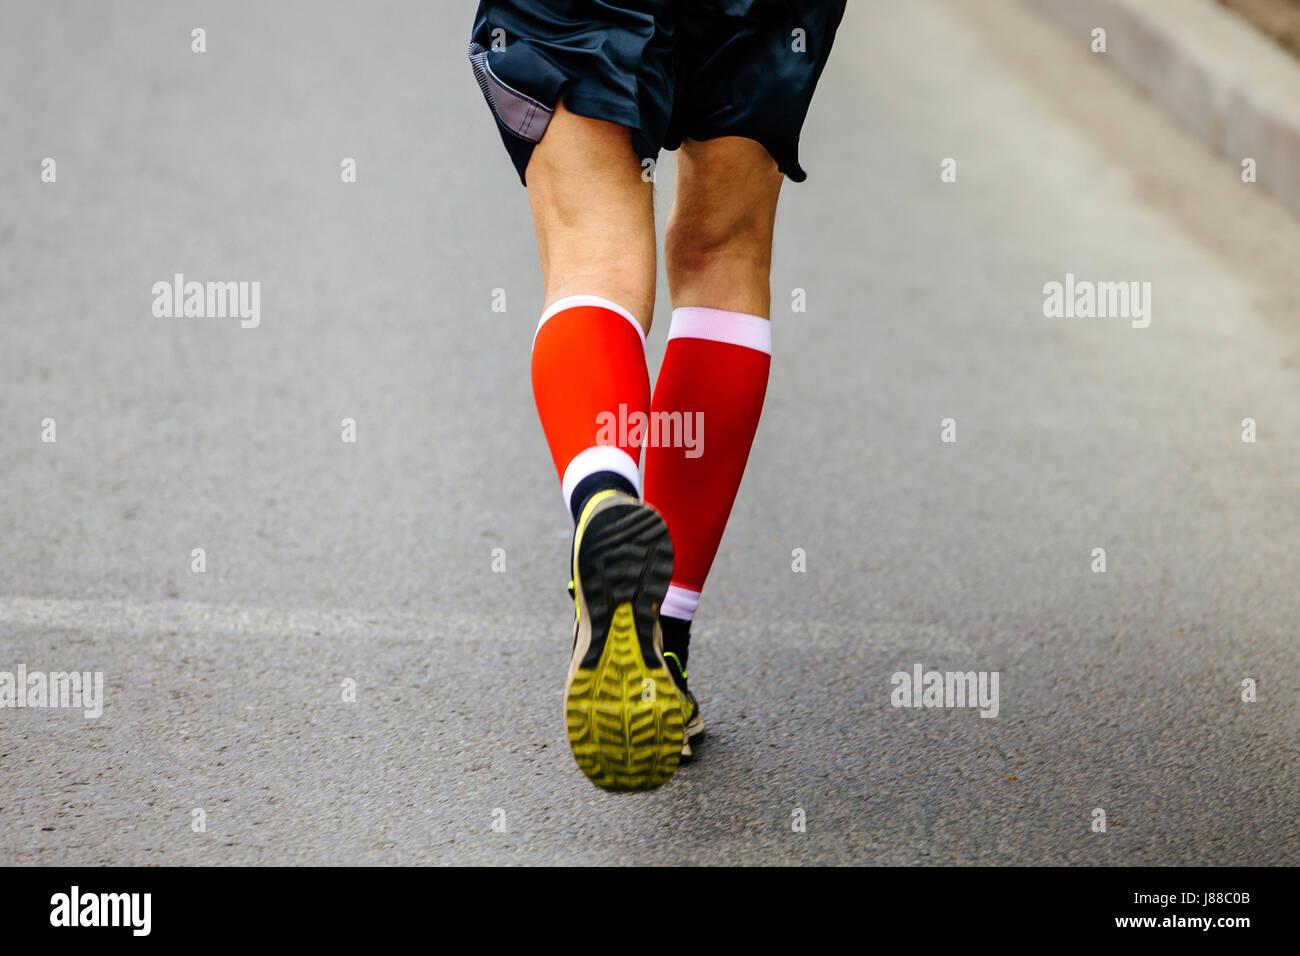 3566a62a9d back feet men runner in red compression socks running street Stock ...